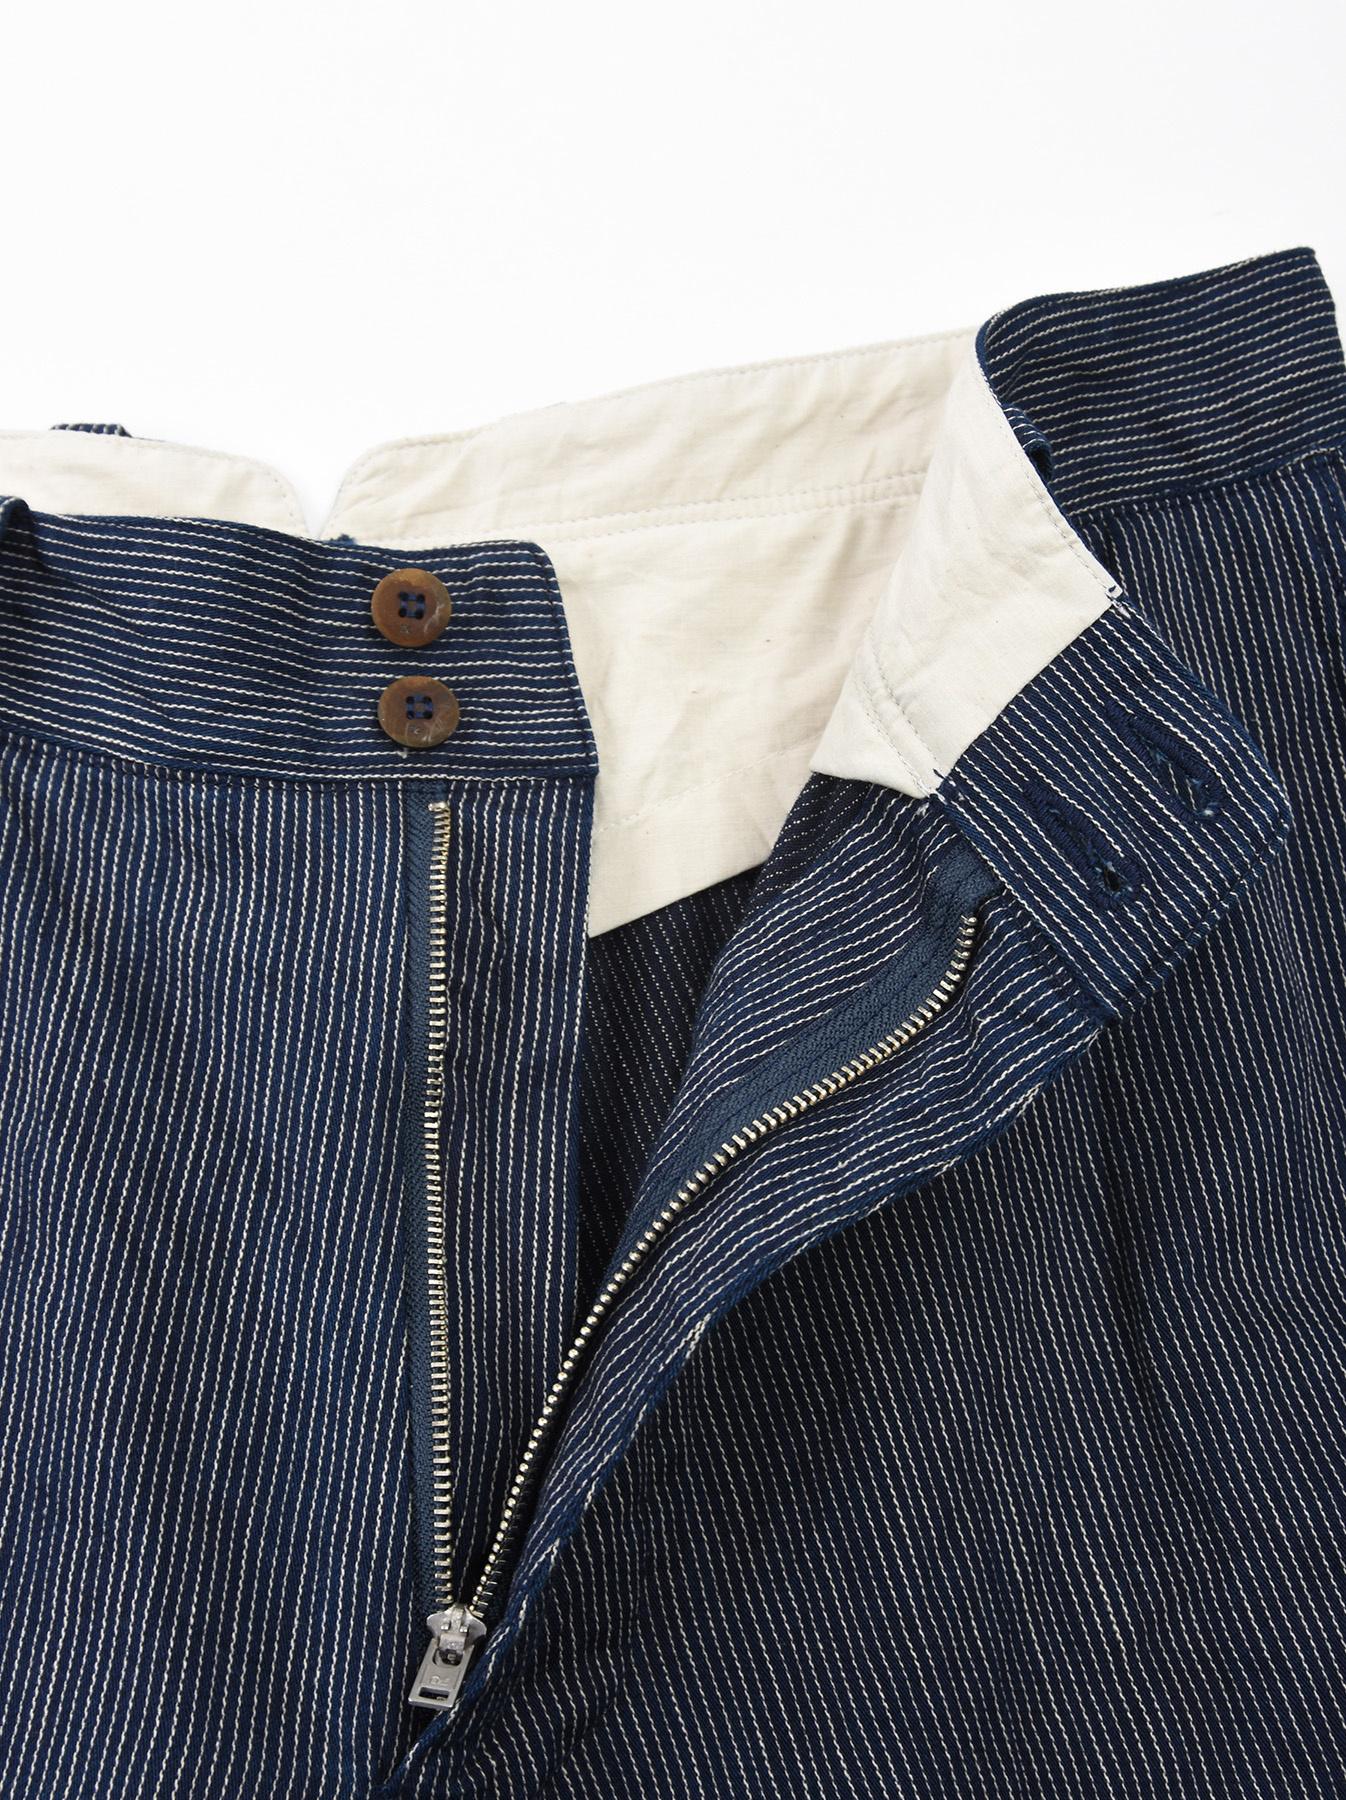 WH Indigo Mugi Yoko-shusi Work Pants-9